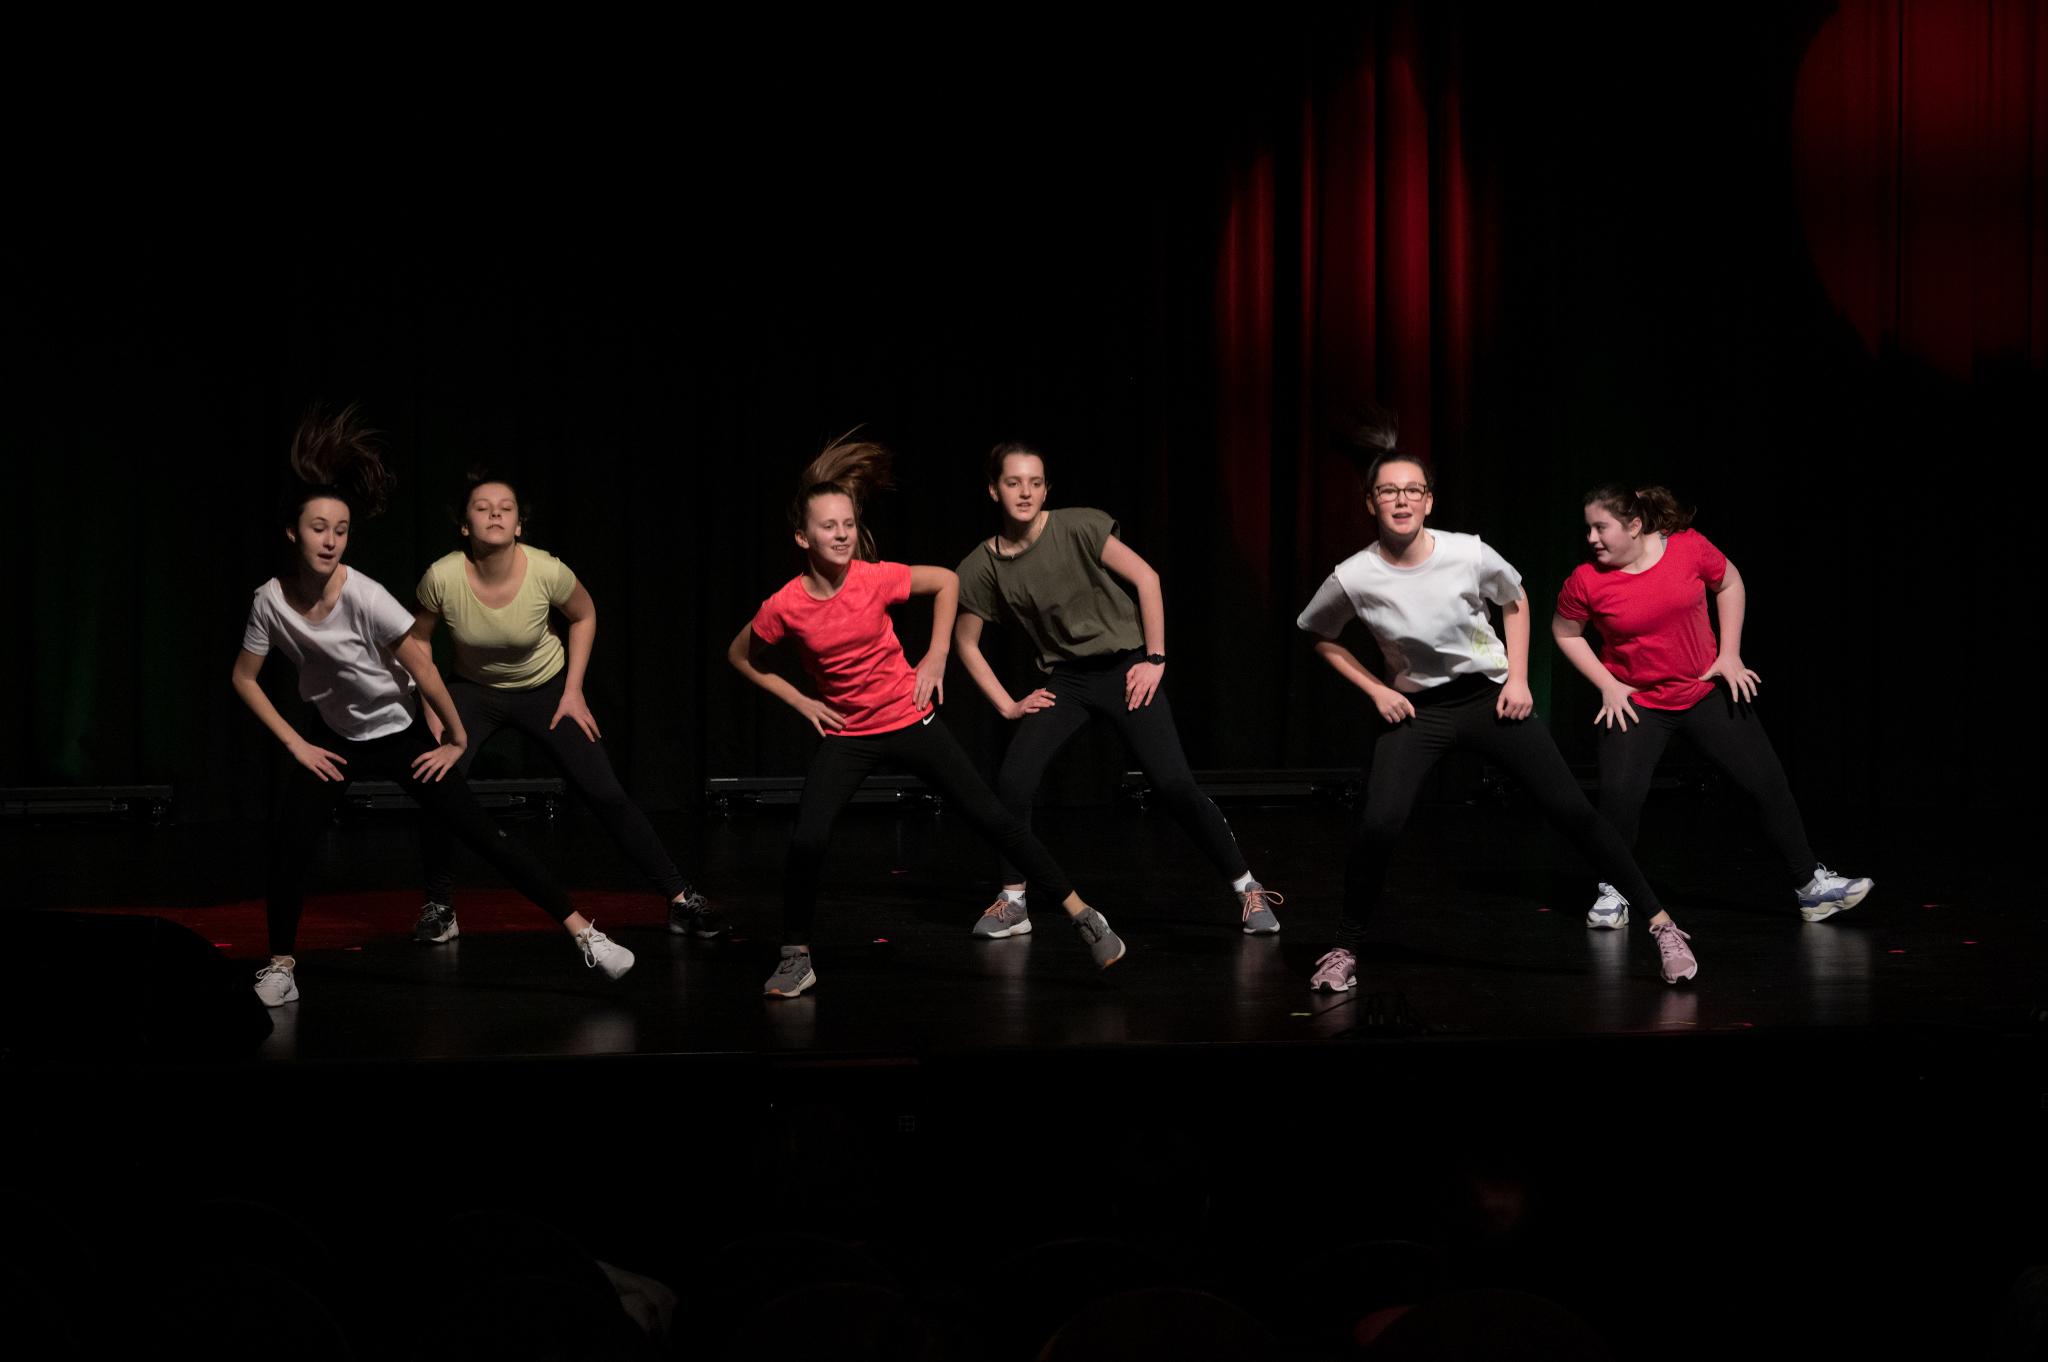 jugendkulturjahr-2020-ratingen-jkj2020-YouthDay-TanzschuleAmWall02